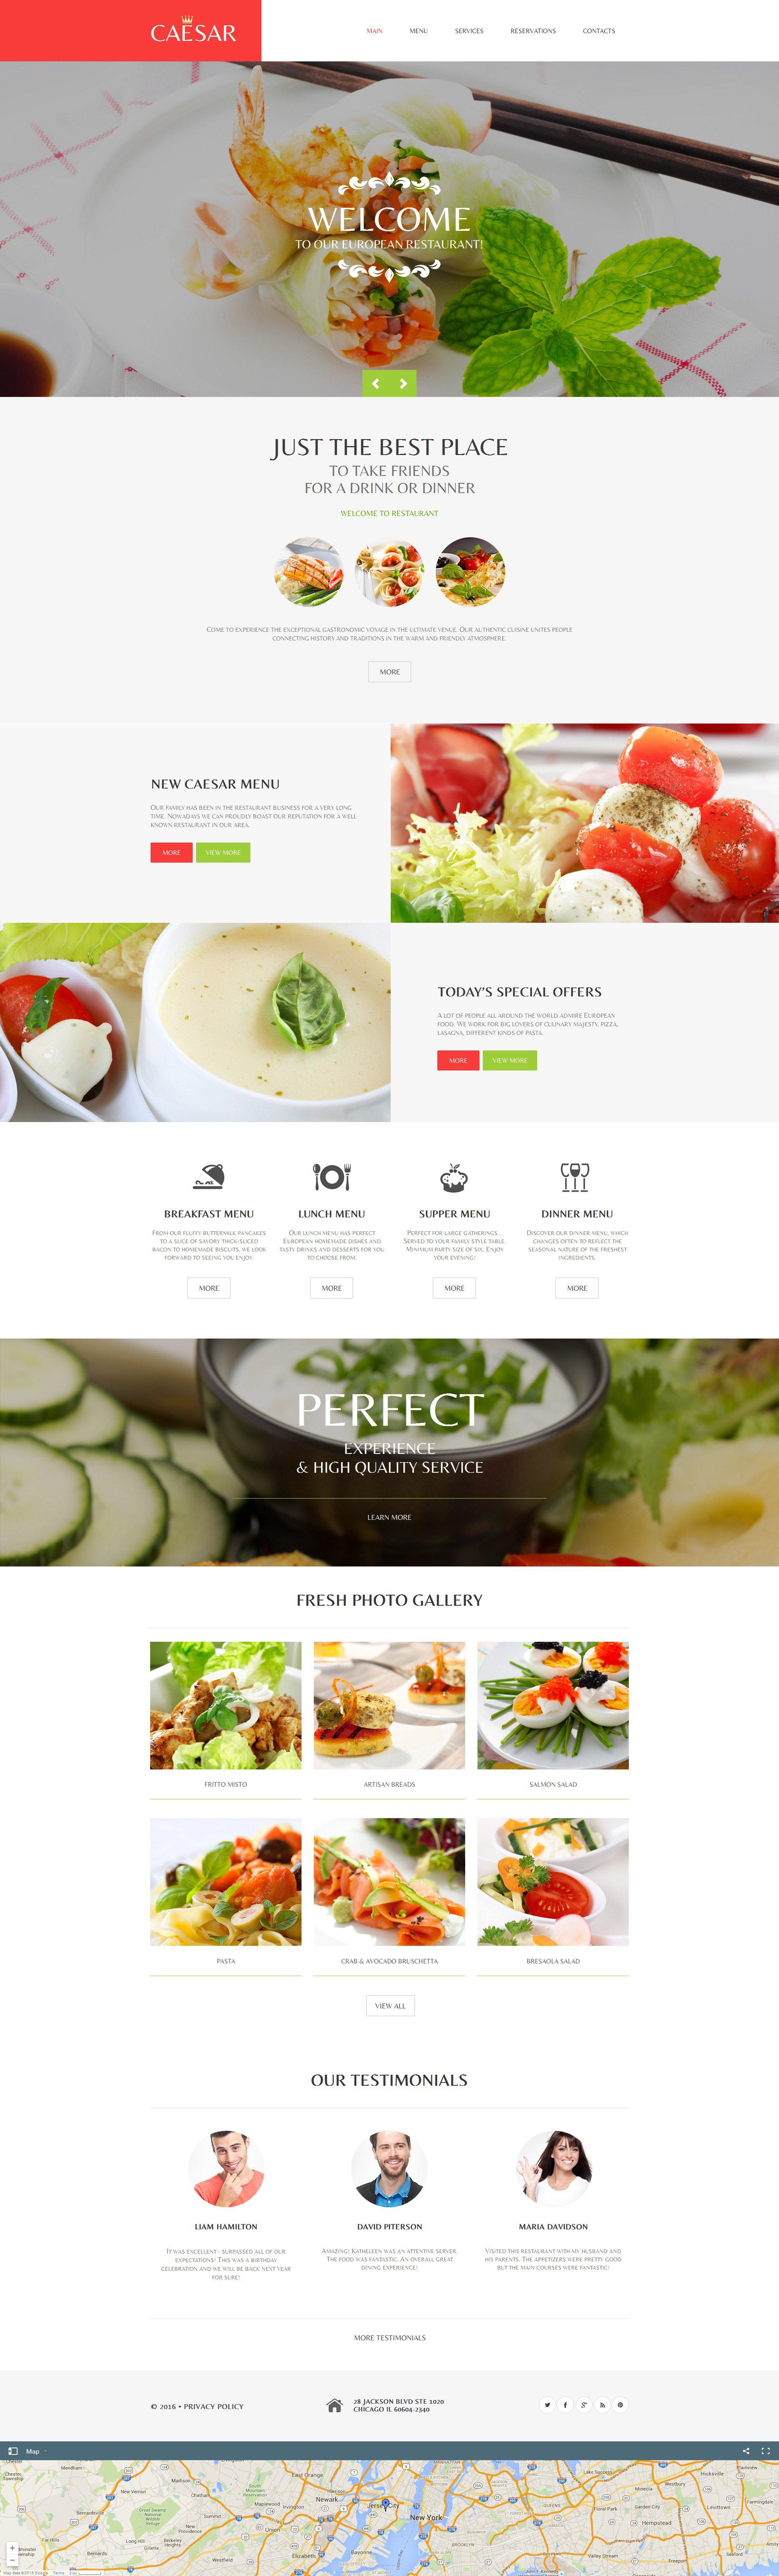 Plantilla Moto CMS HTML #58751 para Sitio de Cafeterías y Restaurantes